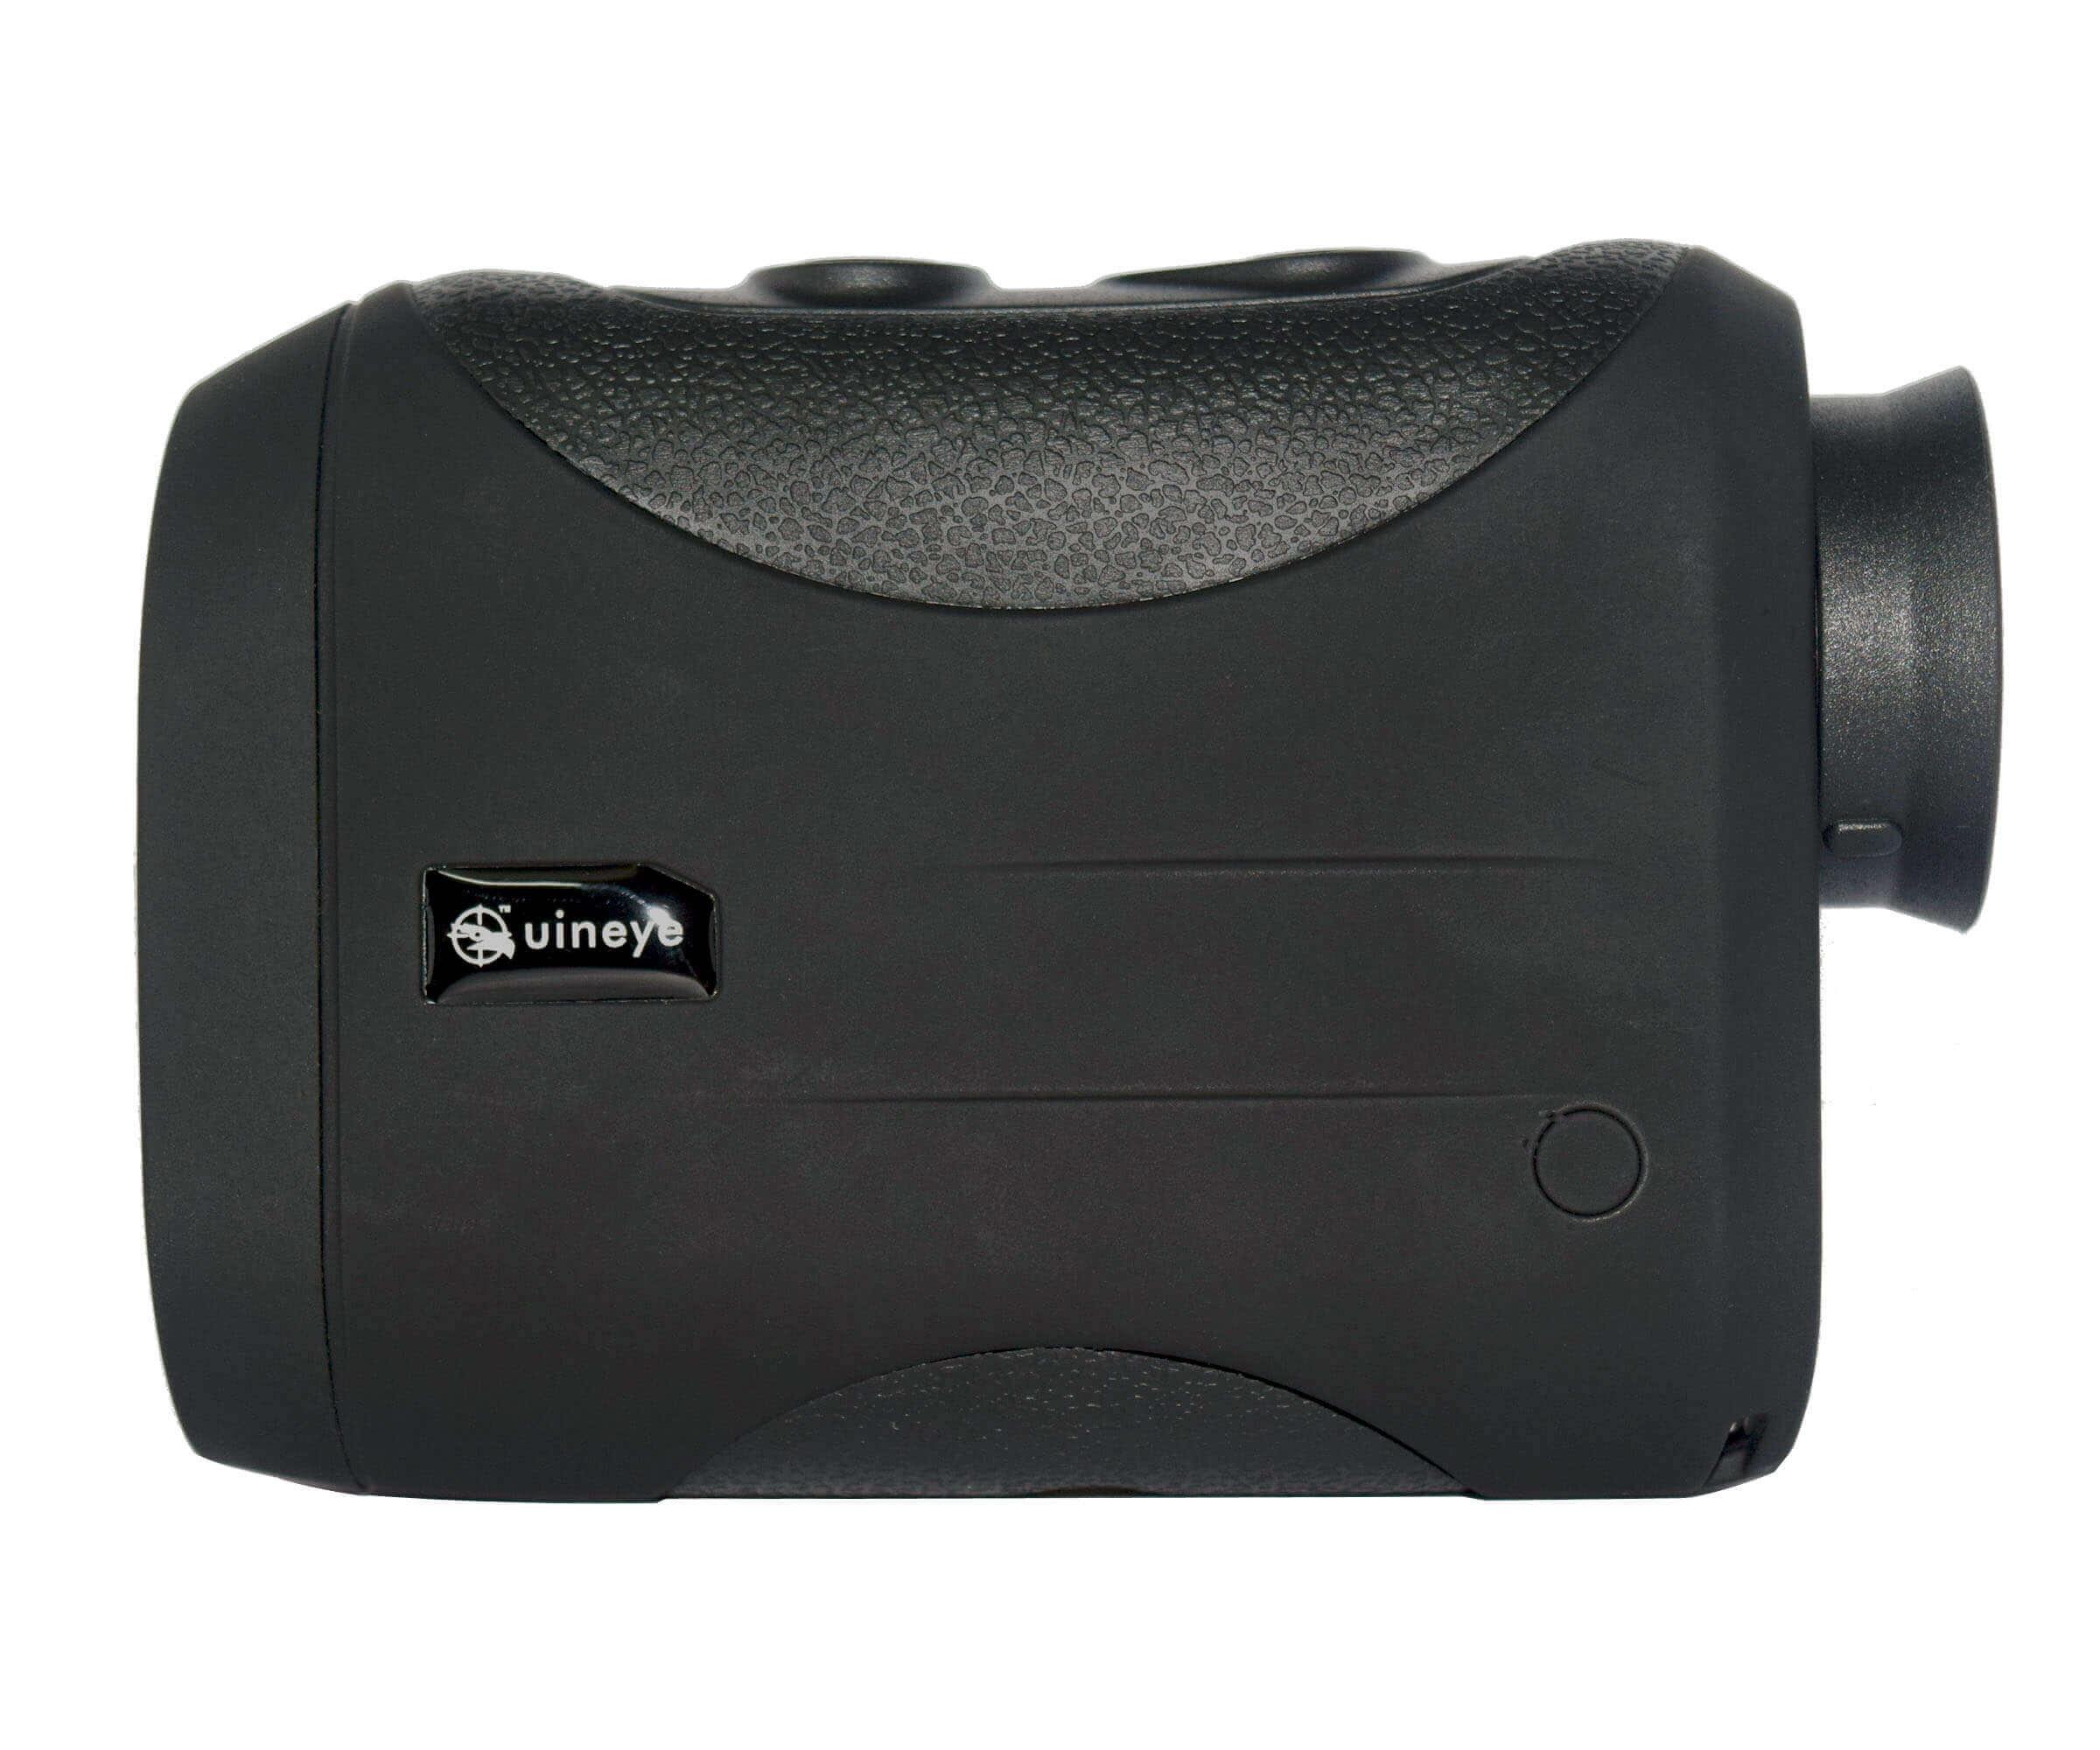 Cheap 8x Magnifier 1312yds Golf Hunting Uineye Rangefinder